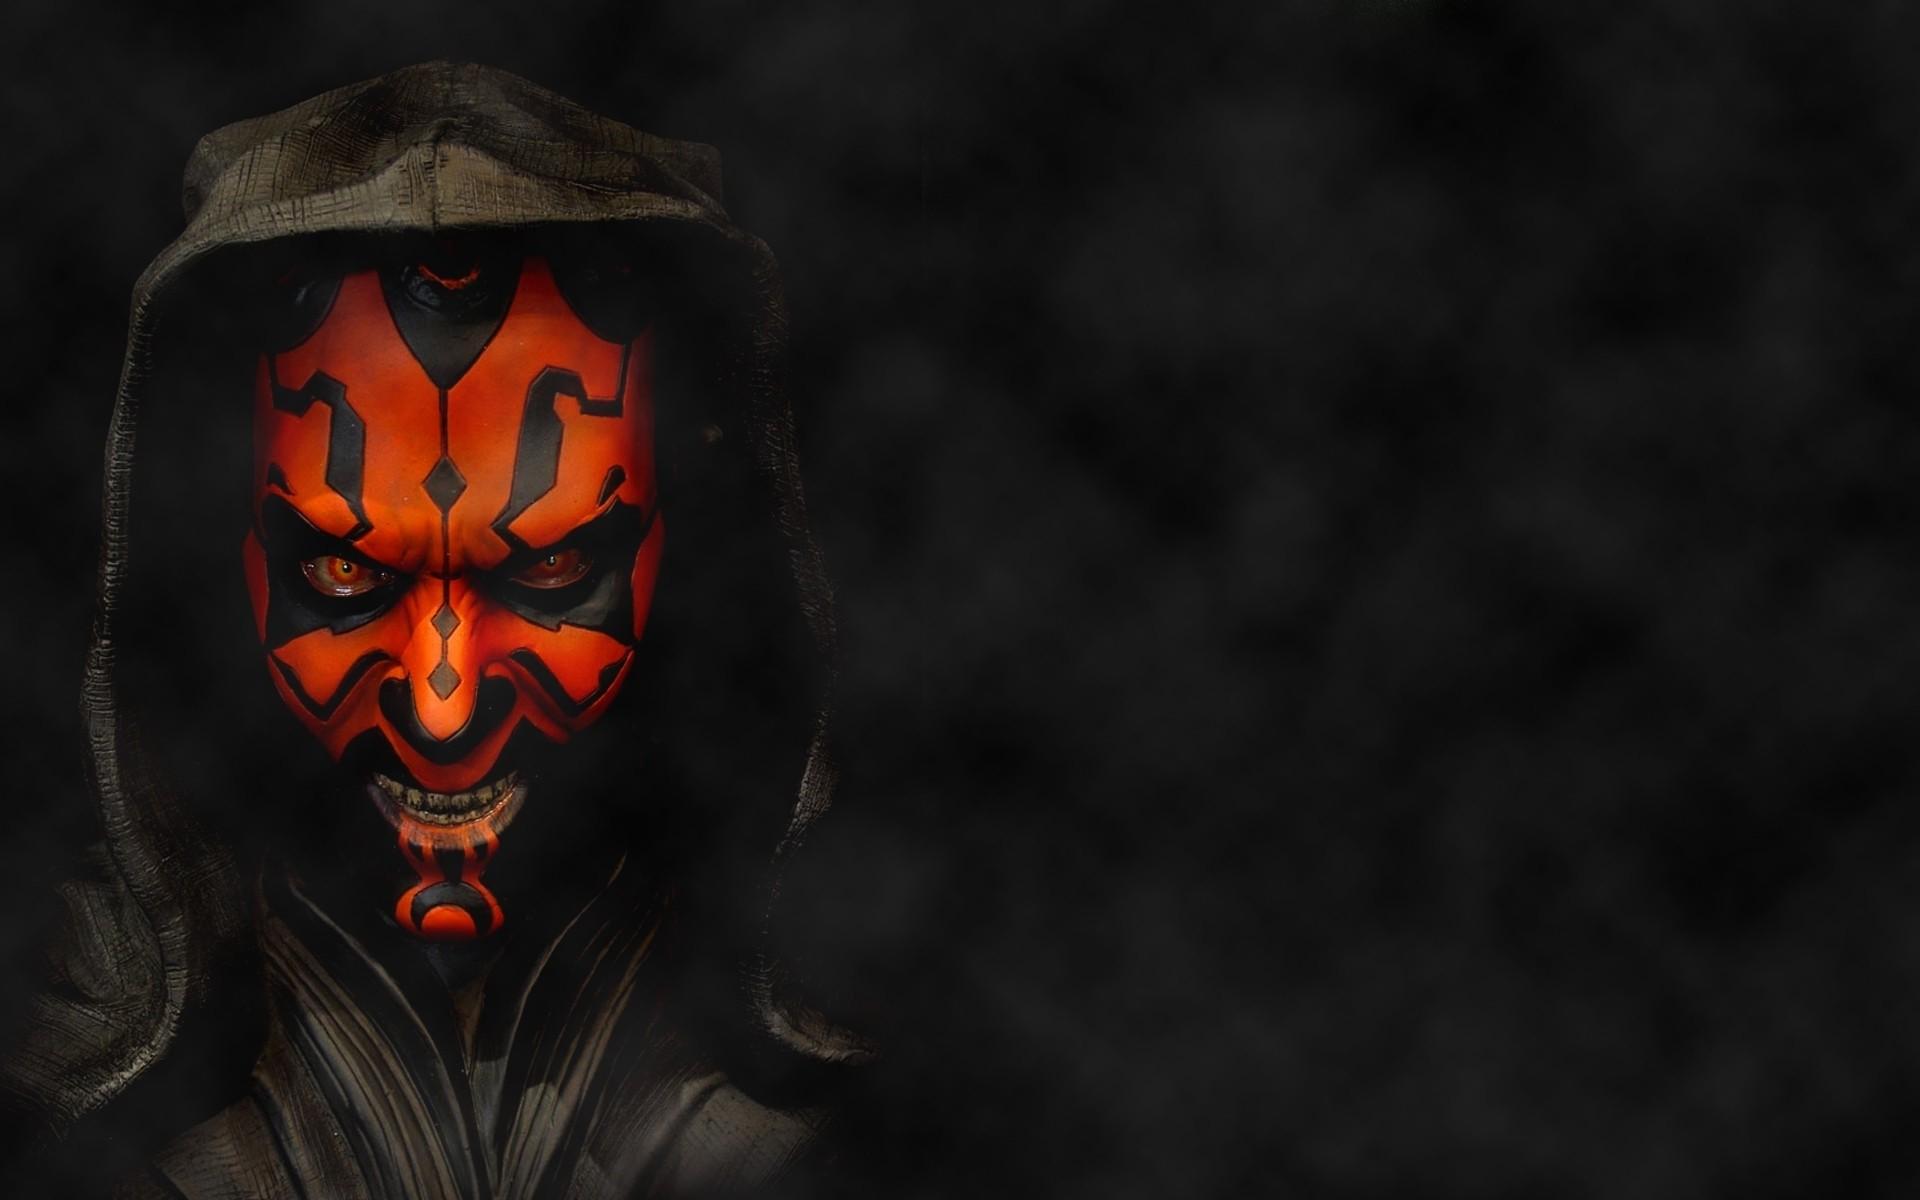 Darth Maul – Star Wars wallpaper – HD Wallpaper Expert